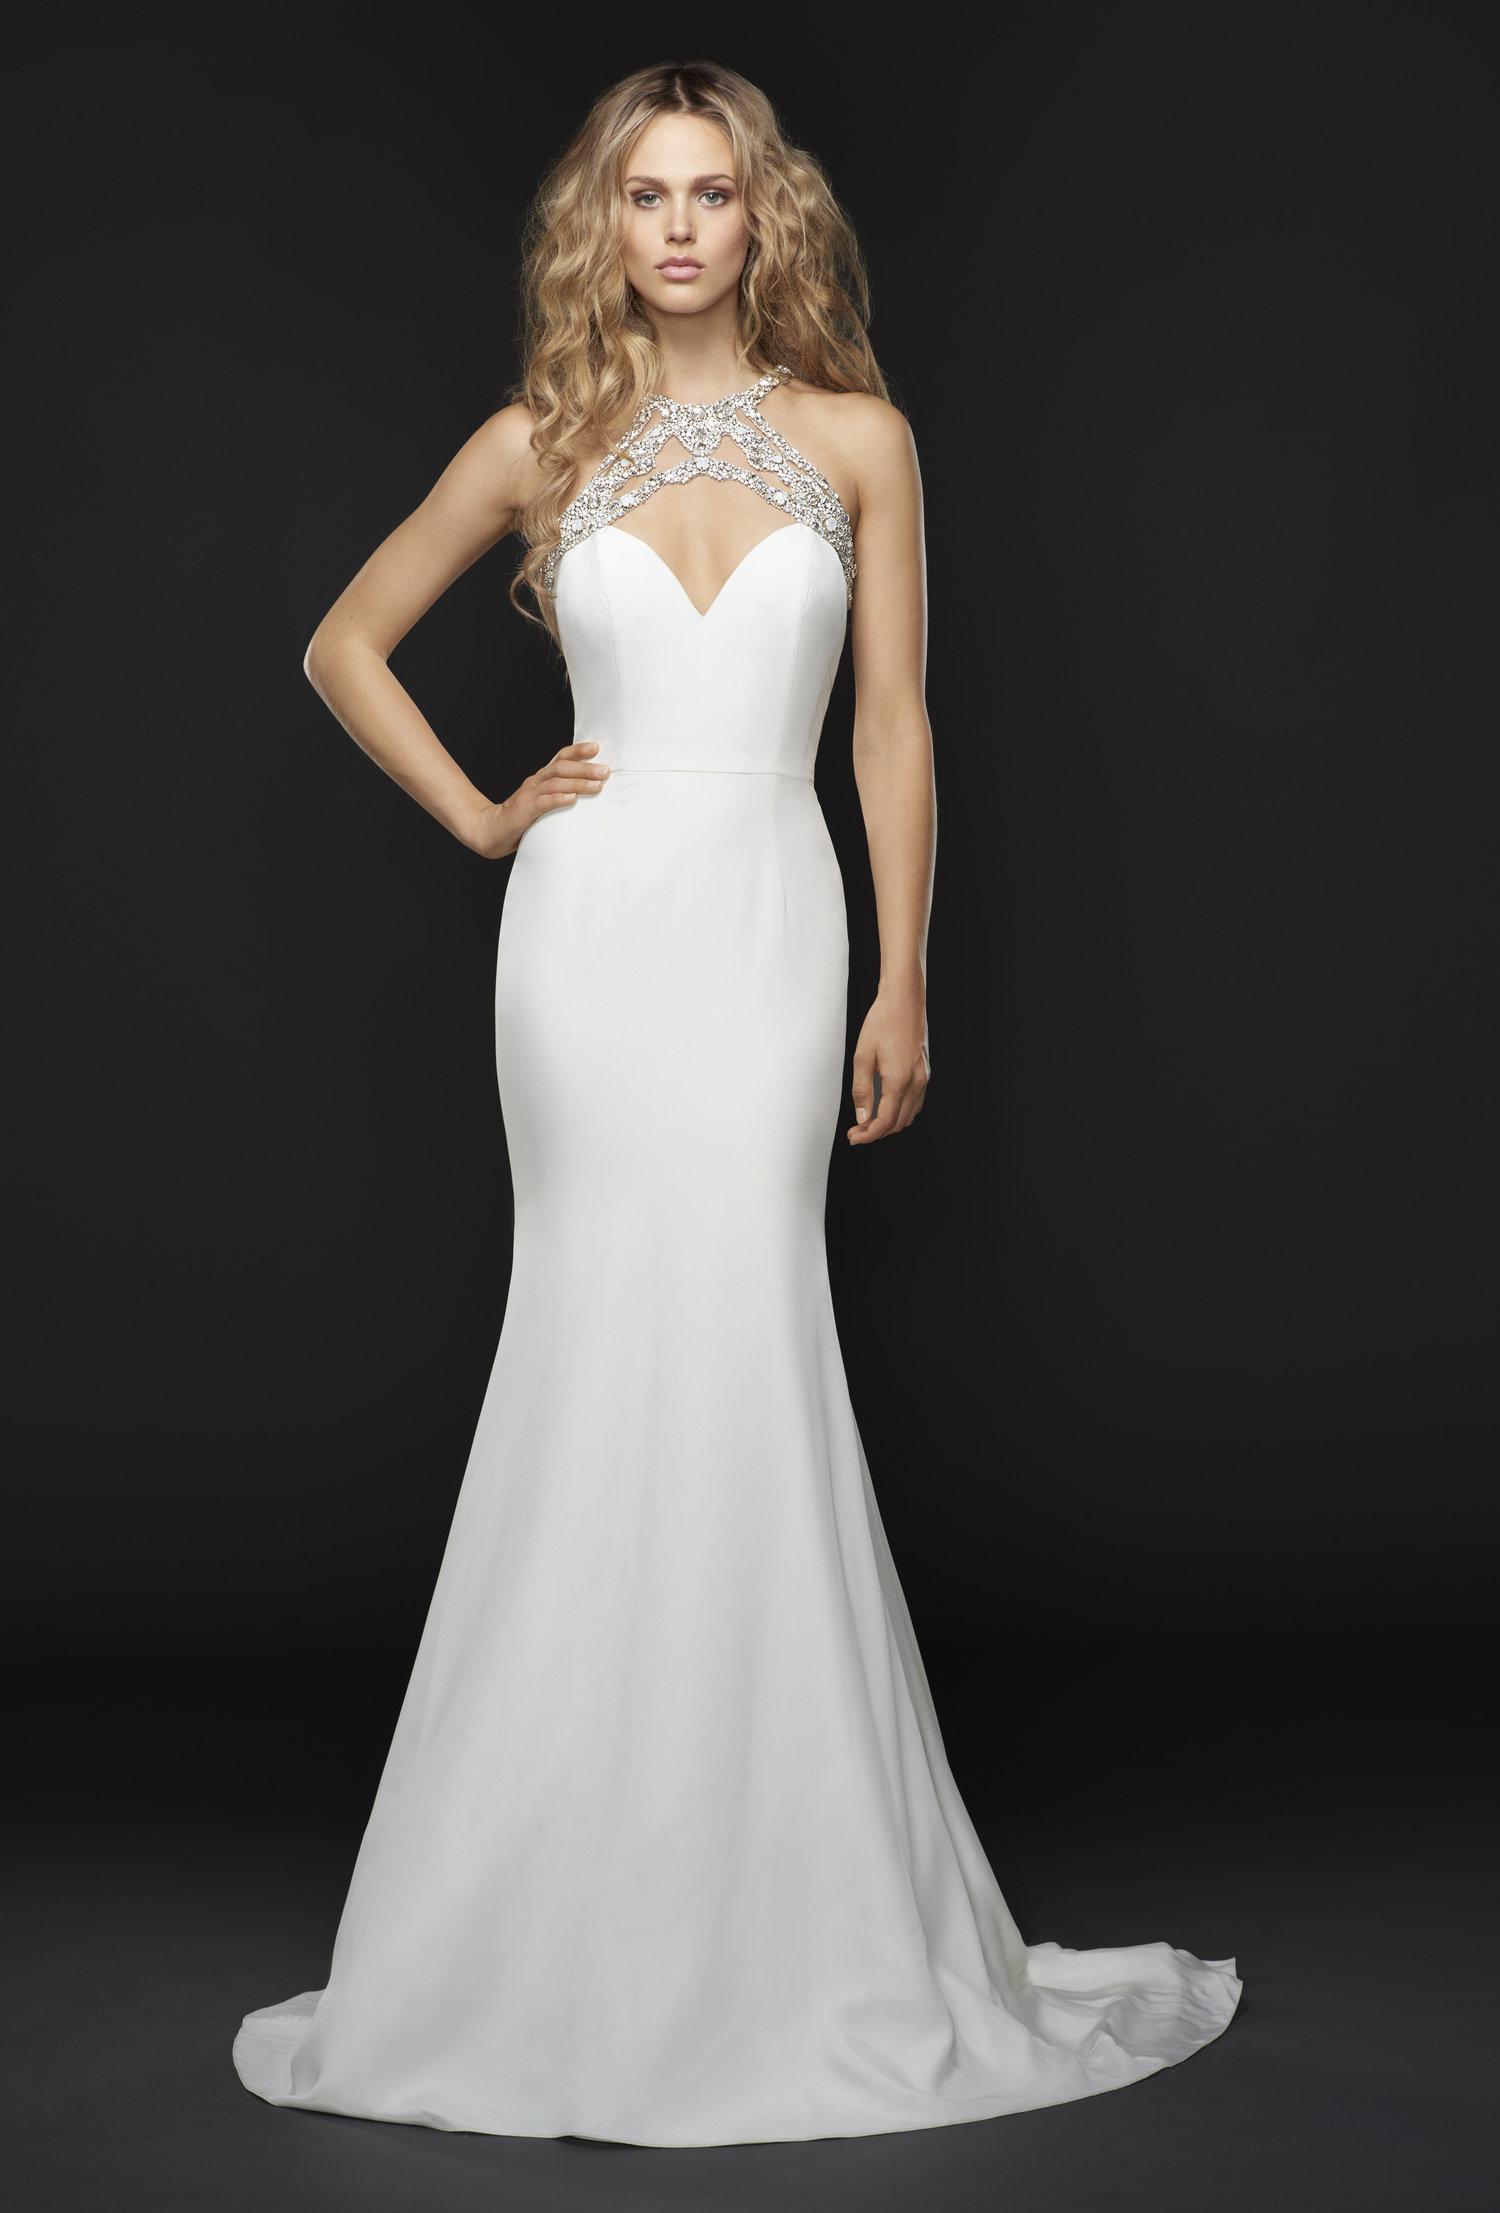 Hayley Paige Sloane Dress / Style 6750